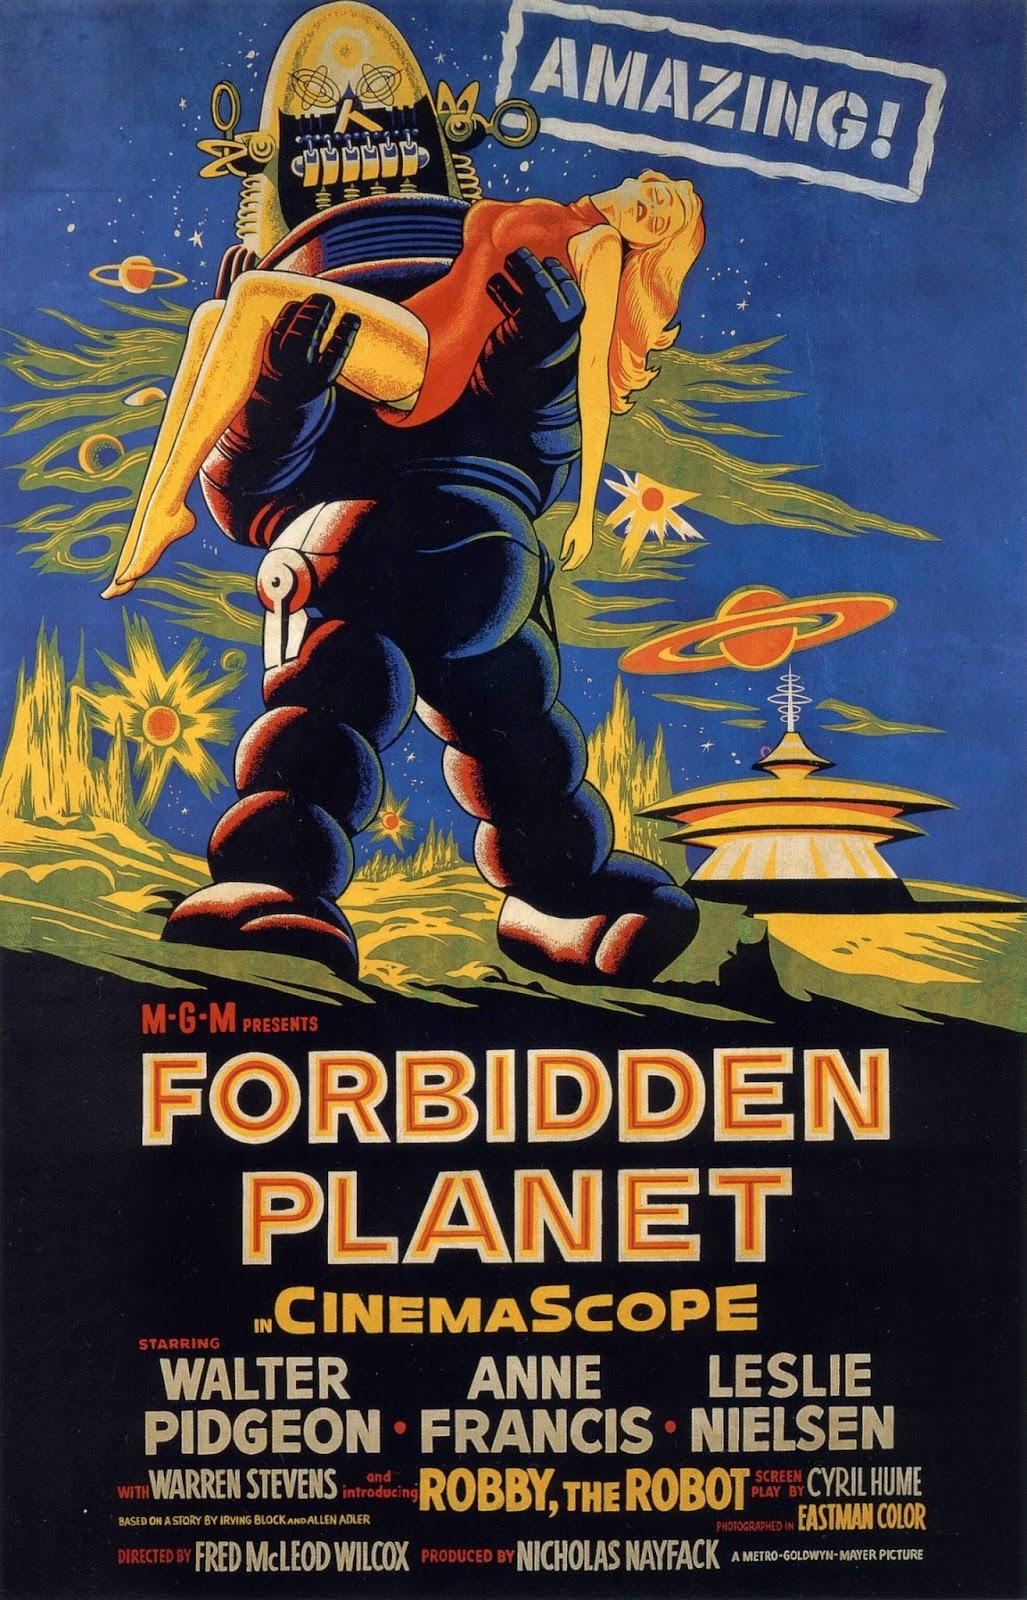 forbidden planet (1958), william malone forbidden planet robby, the robot